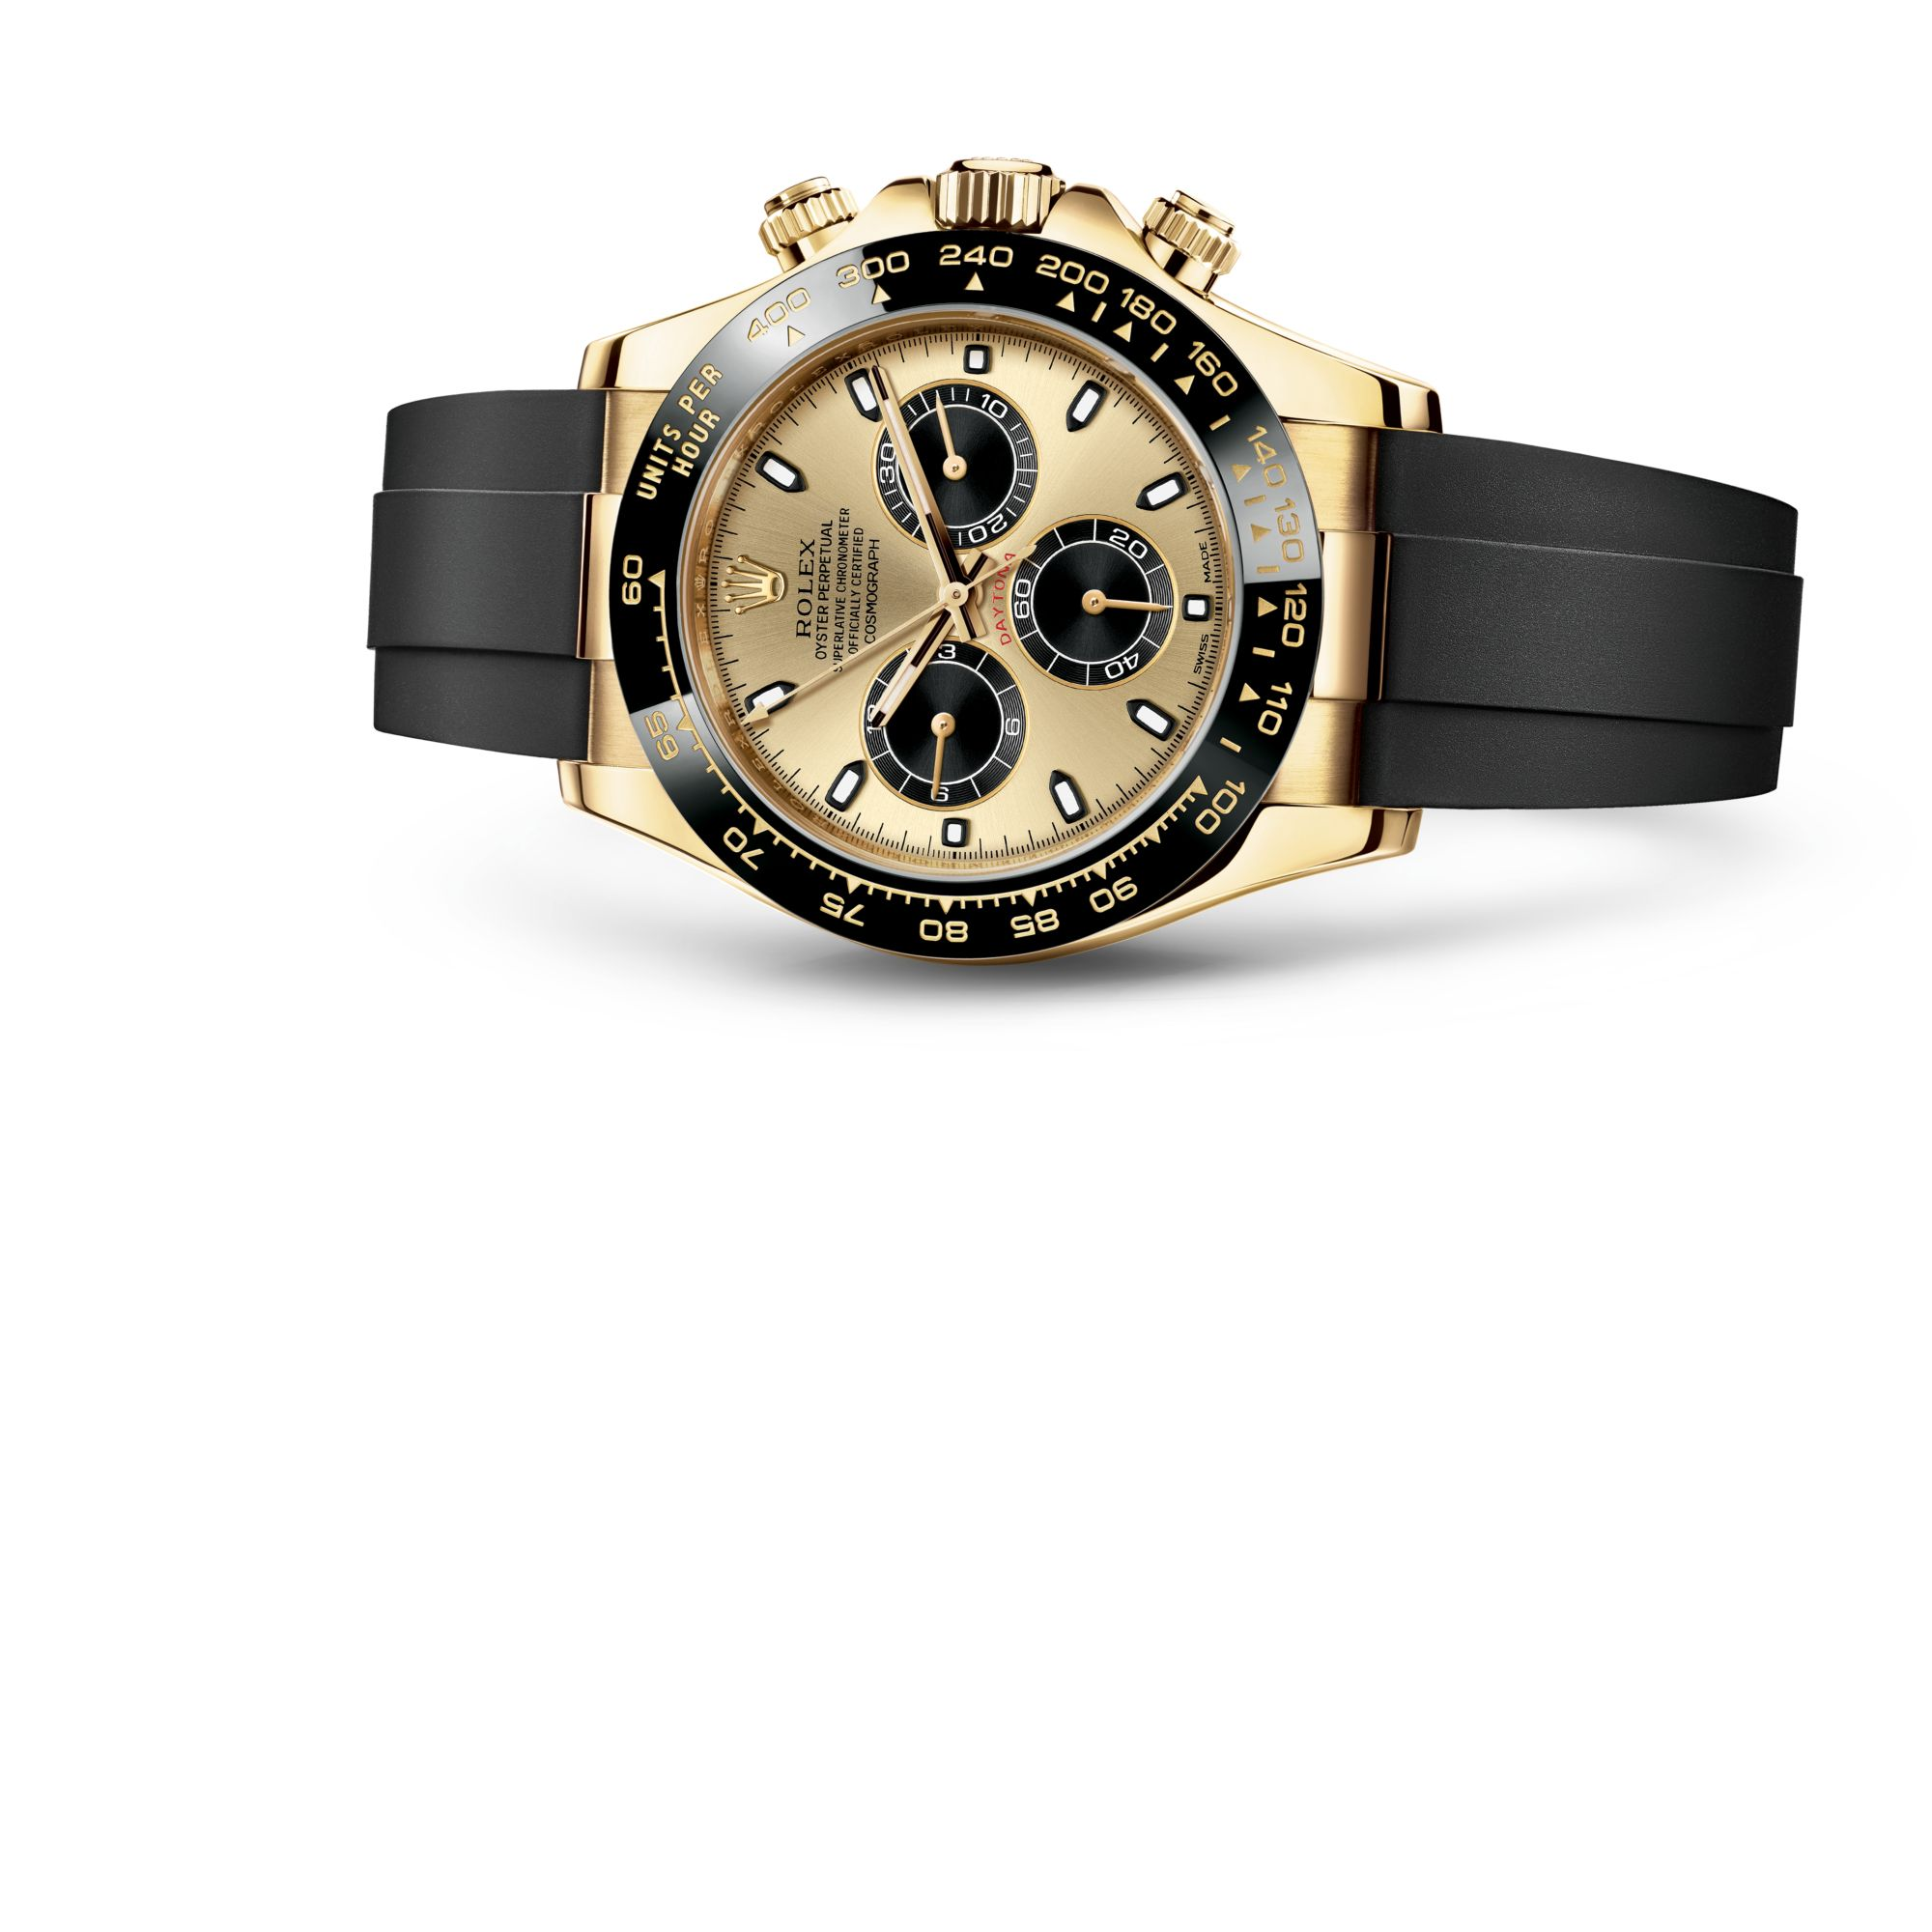 Rolex كوزموغراف دايتونا M116518LN-0040